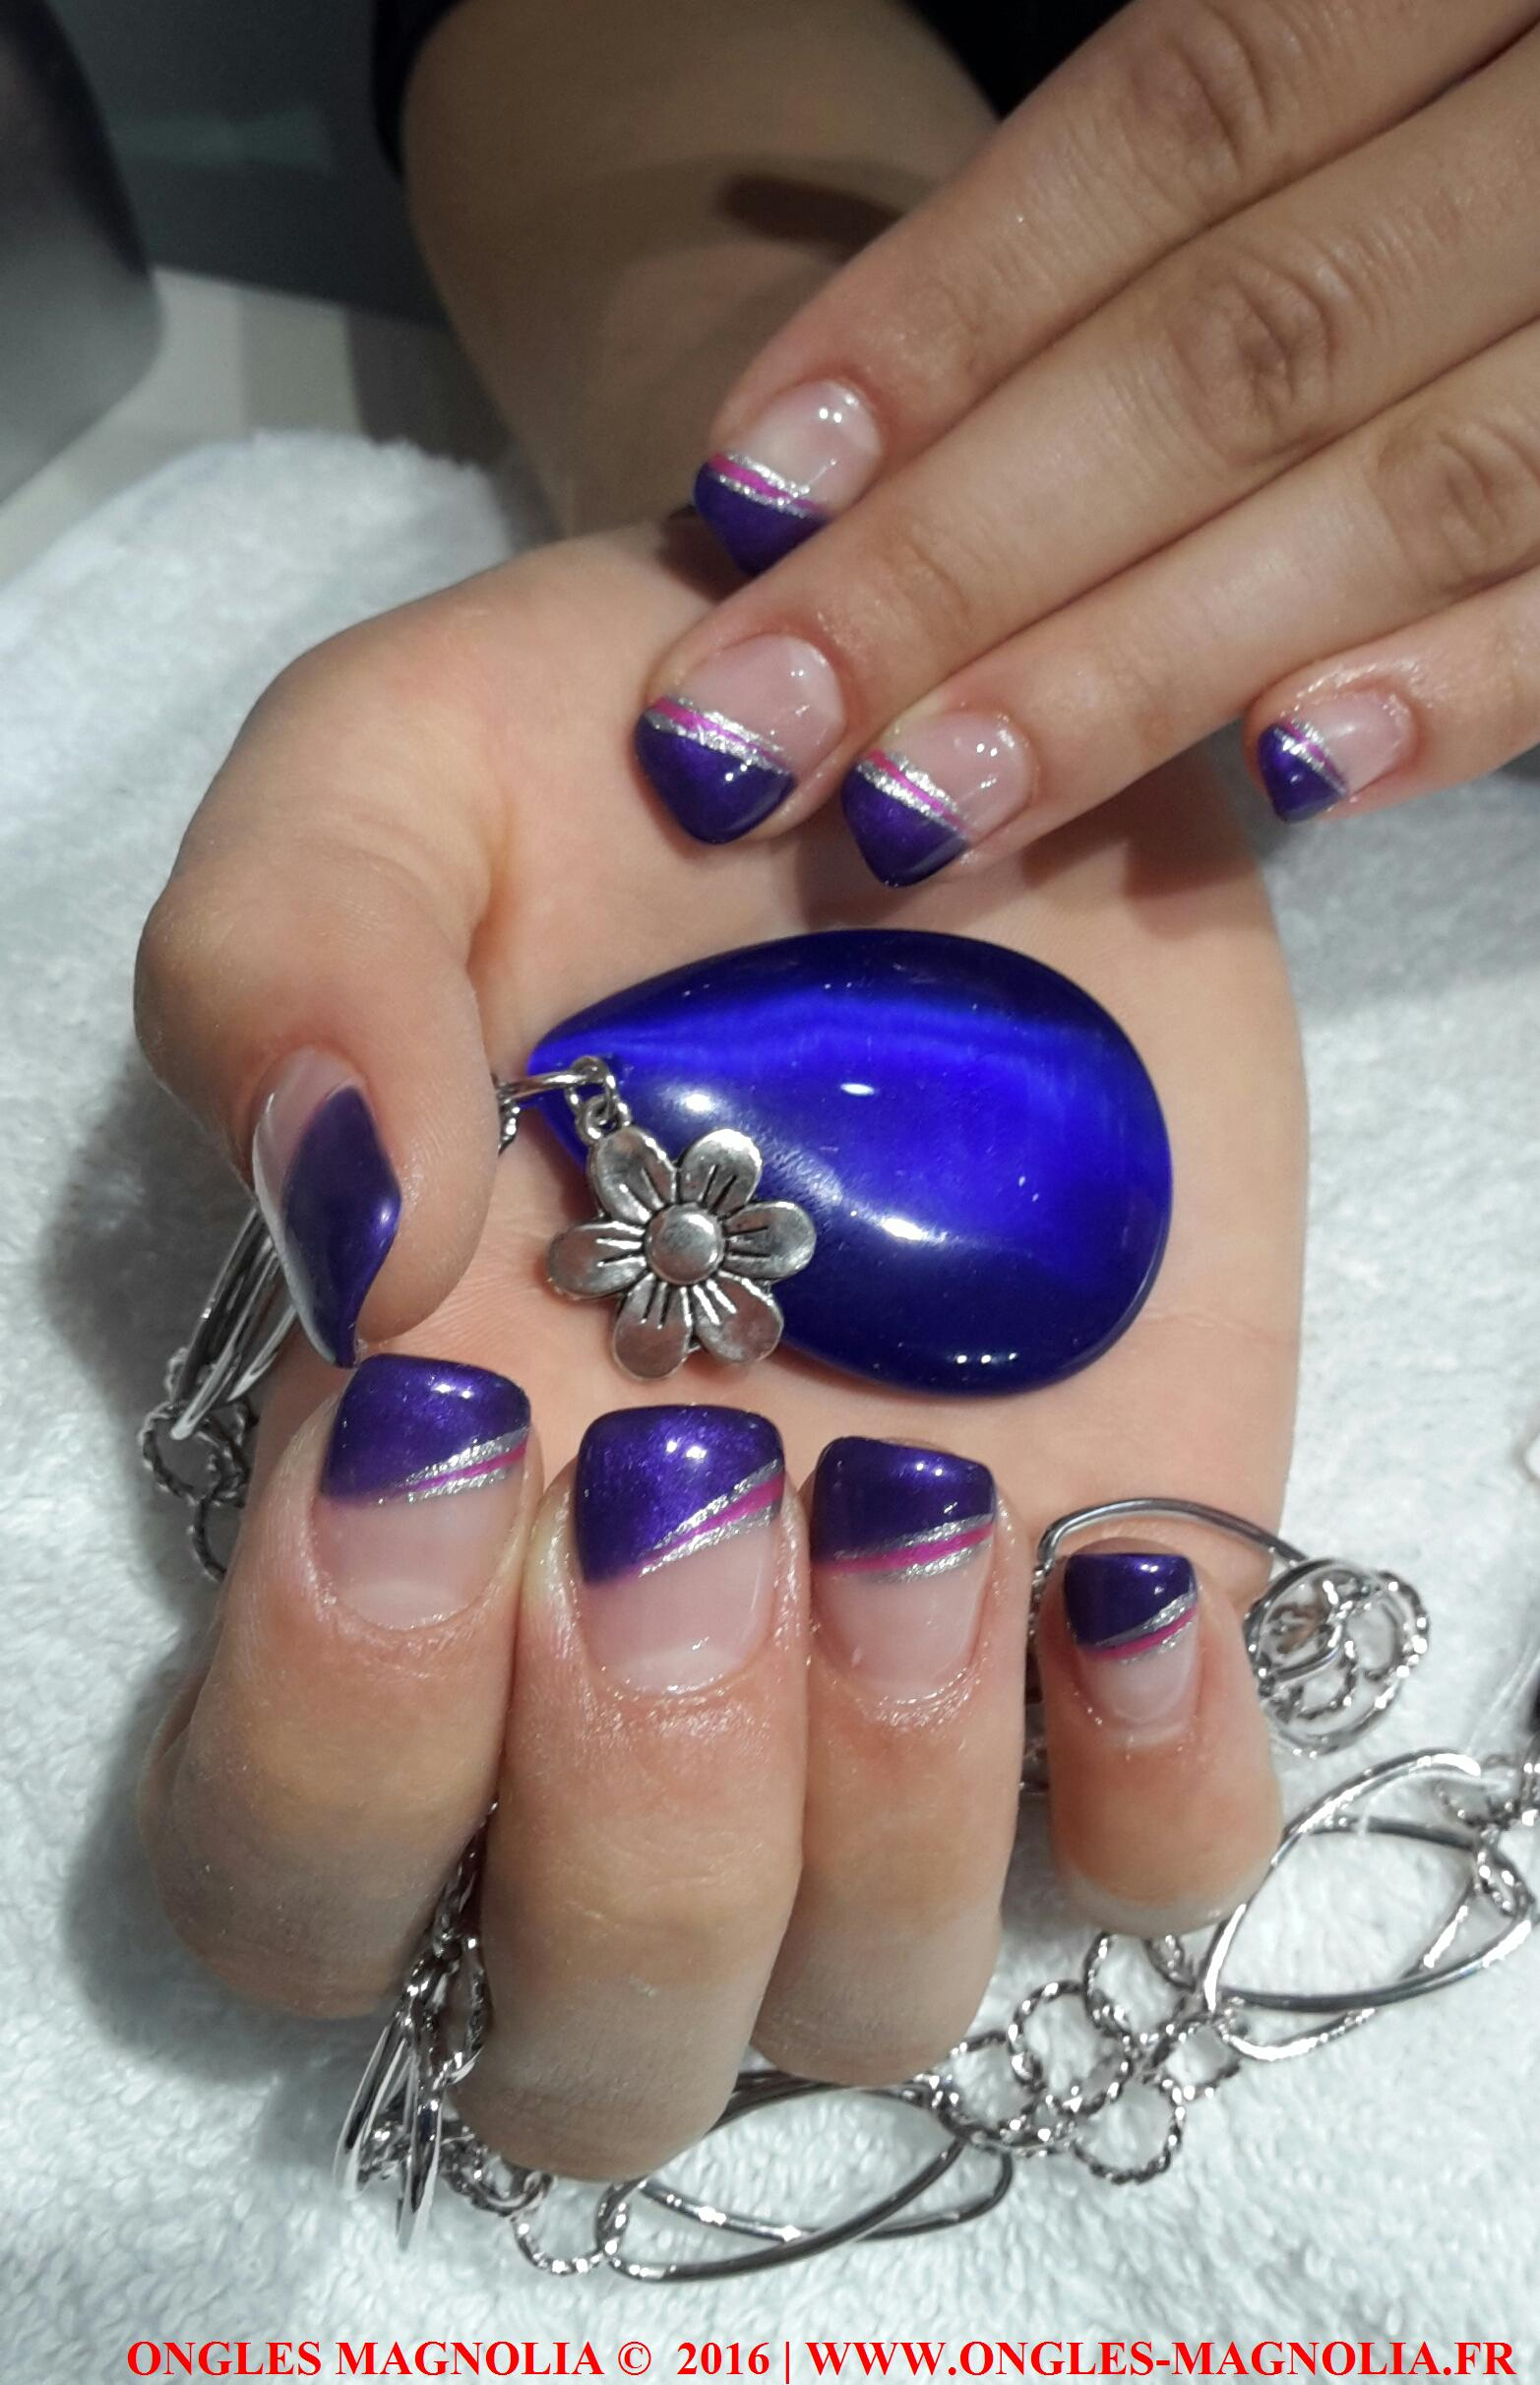 Pose-ongles-nail-art-neuville-sur-saone-lyon-ongles magnolia 022016